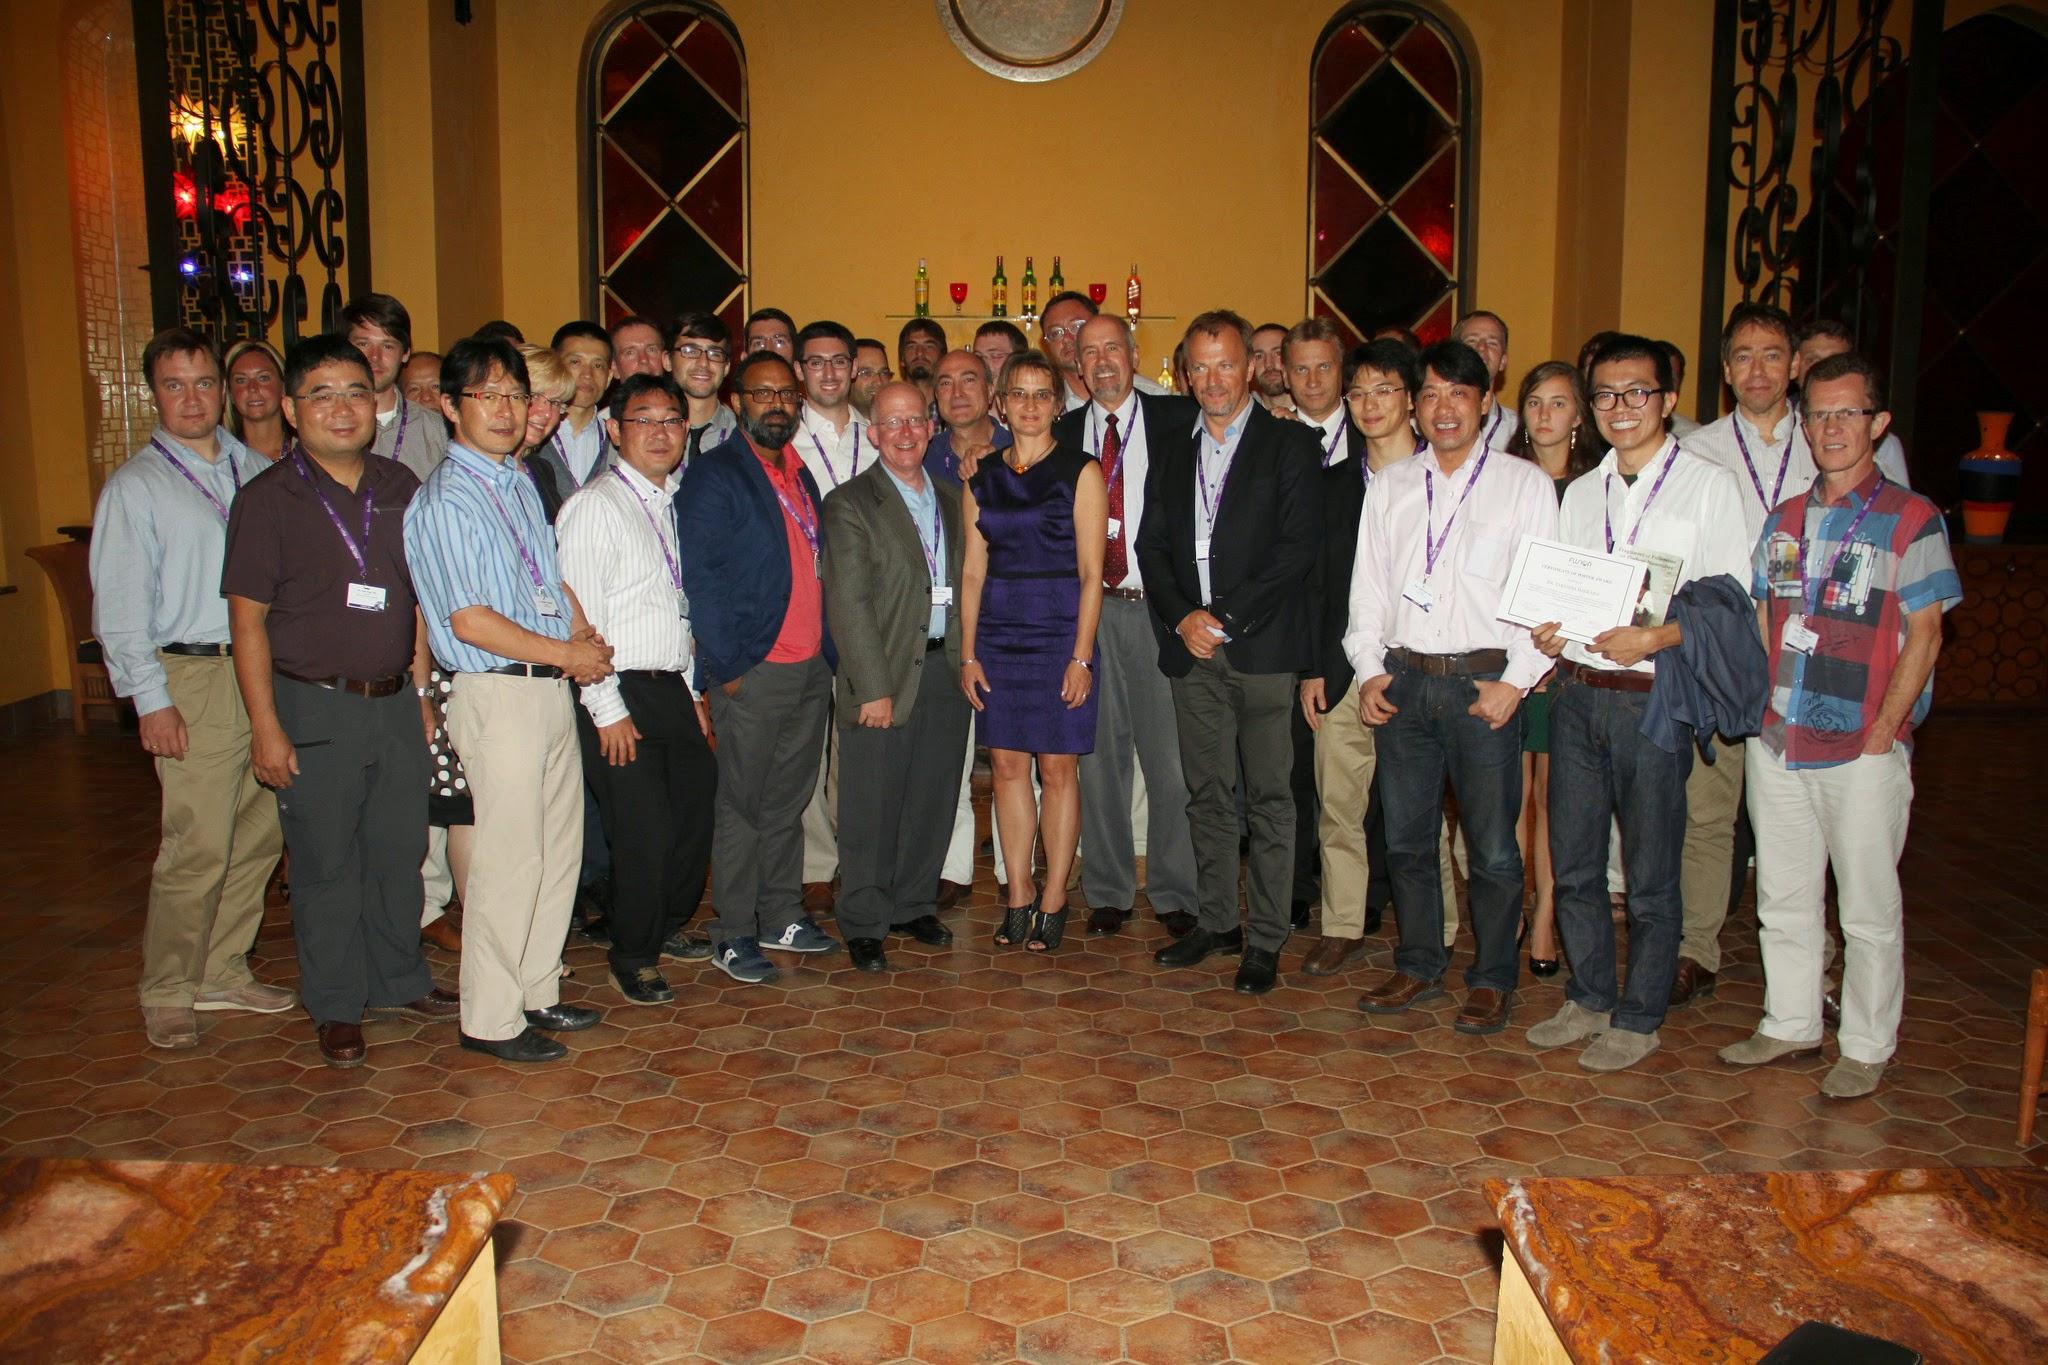 Photo: Group photo (Photo Credit: Fusion Conferences)